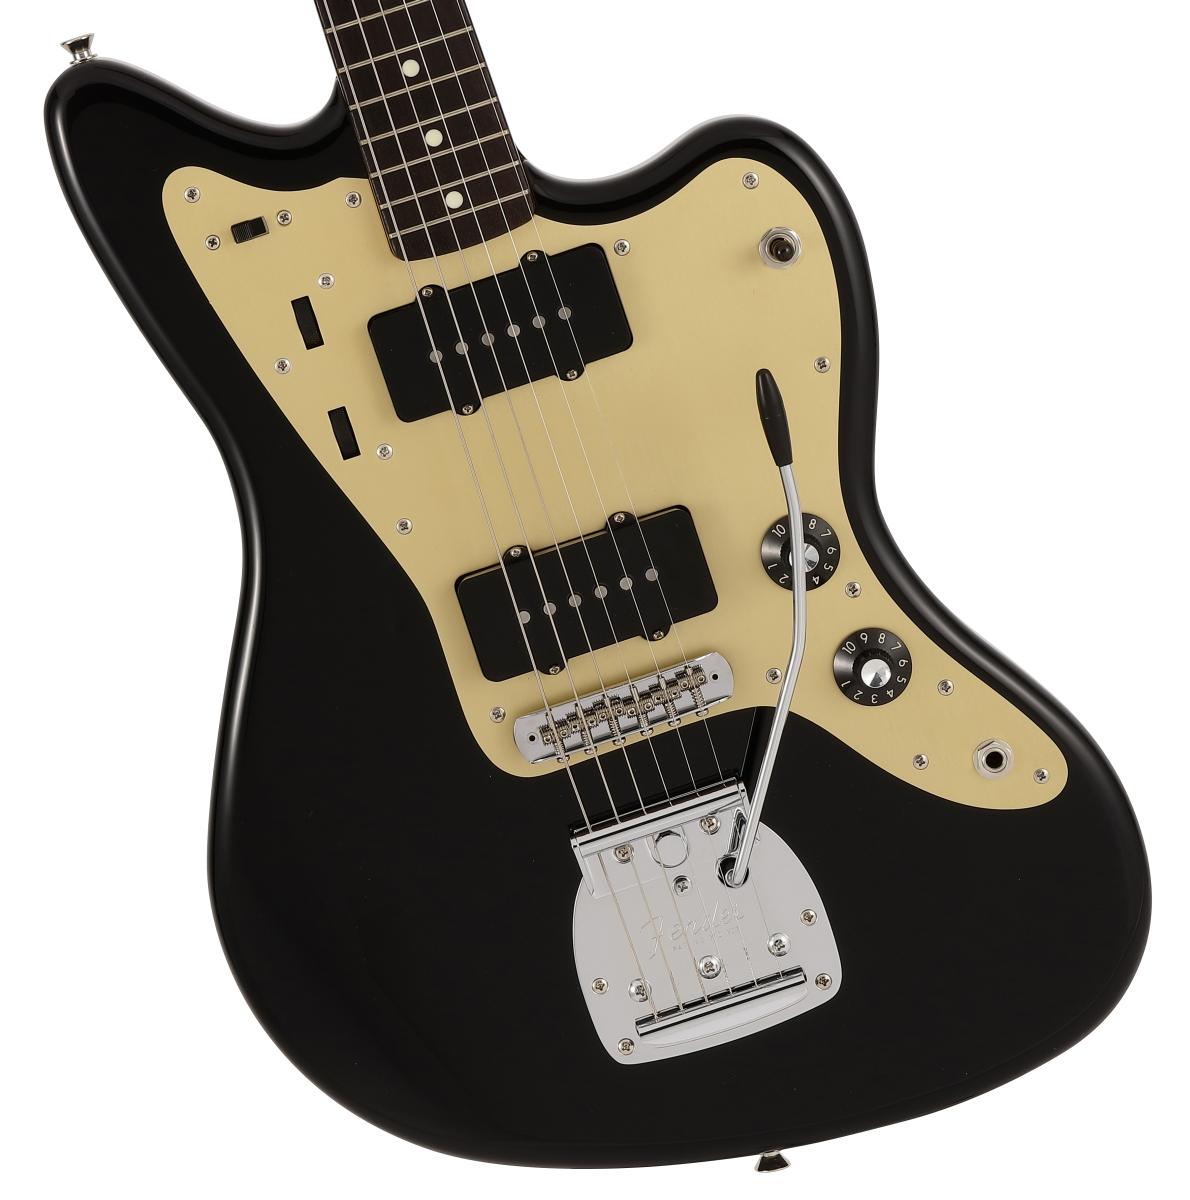 Fender / Made In Japan INORAN Jazzmaster Rosewood Fingerboard Black フェンダー《純正チューナーとピック12枚プレゼント!/+811179700》【未展示在庫有り】【PTNB】